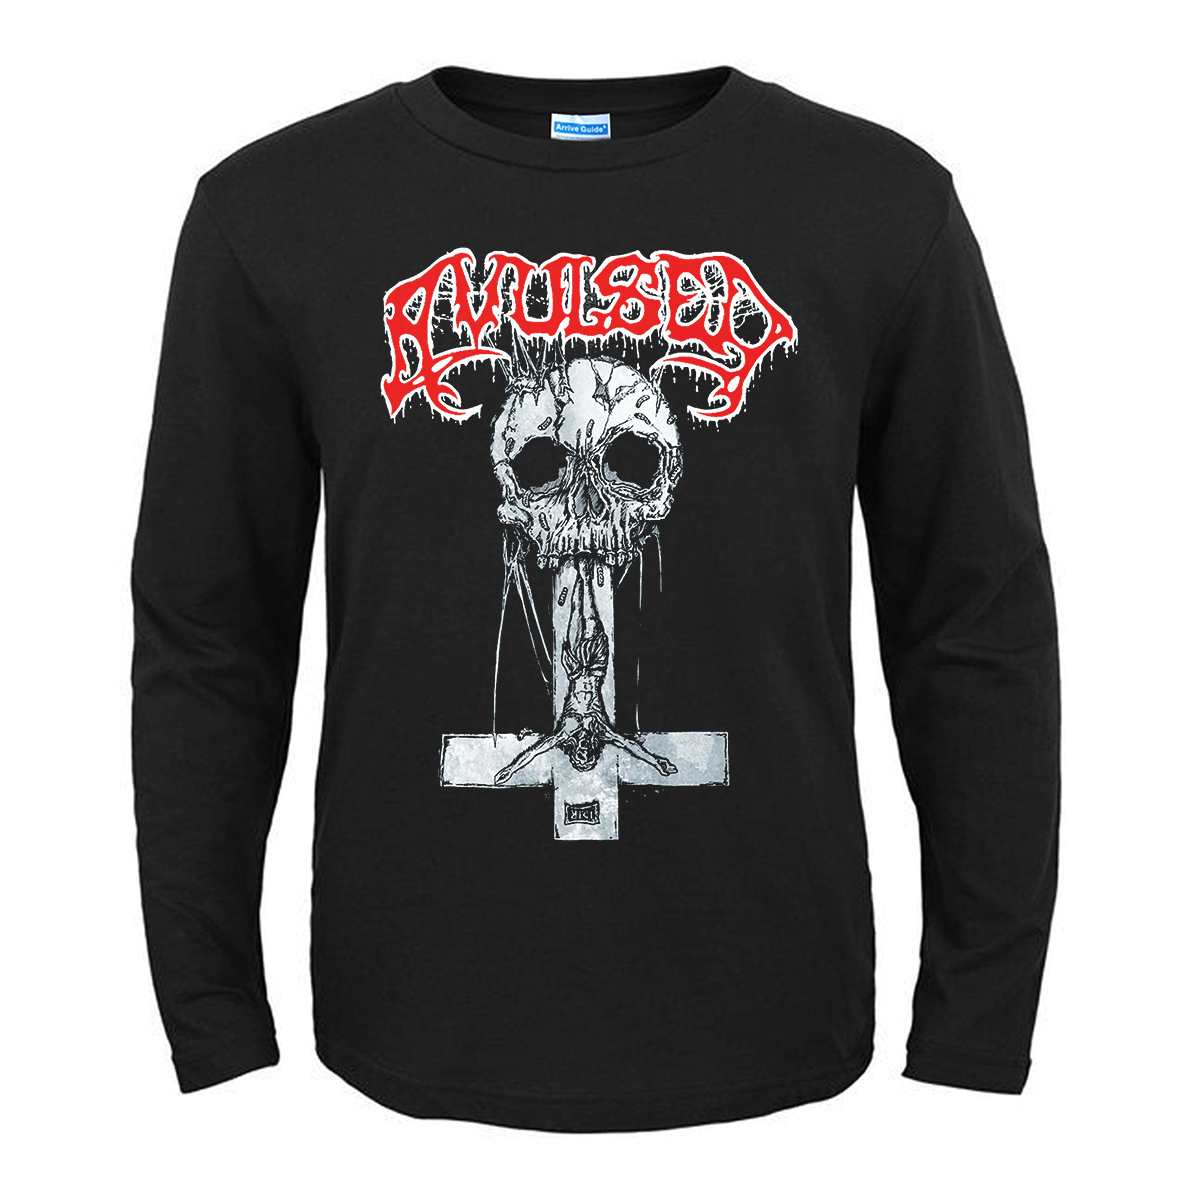 Merchandise T-Shirt Avulsed Death Metal